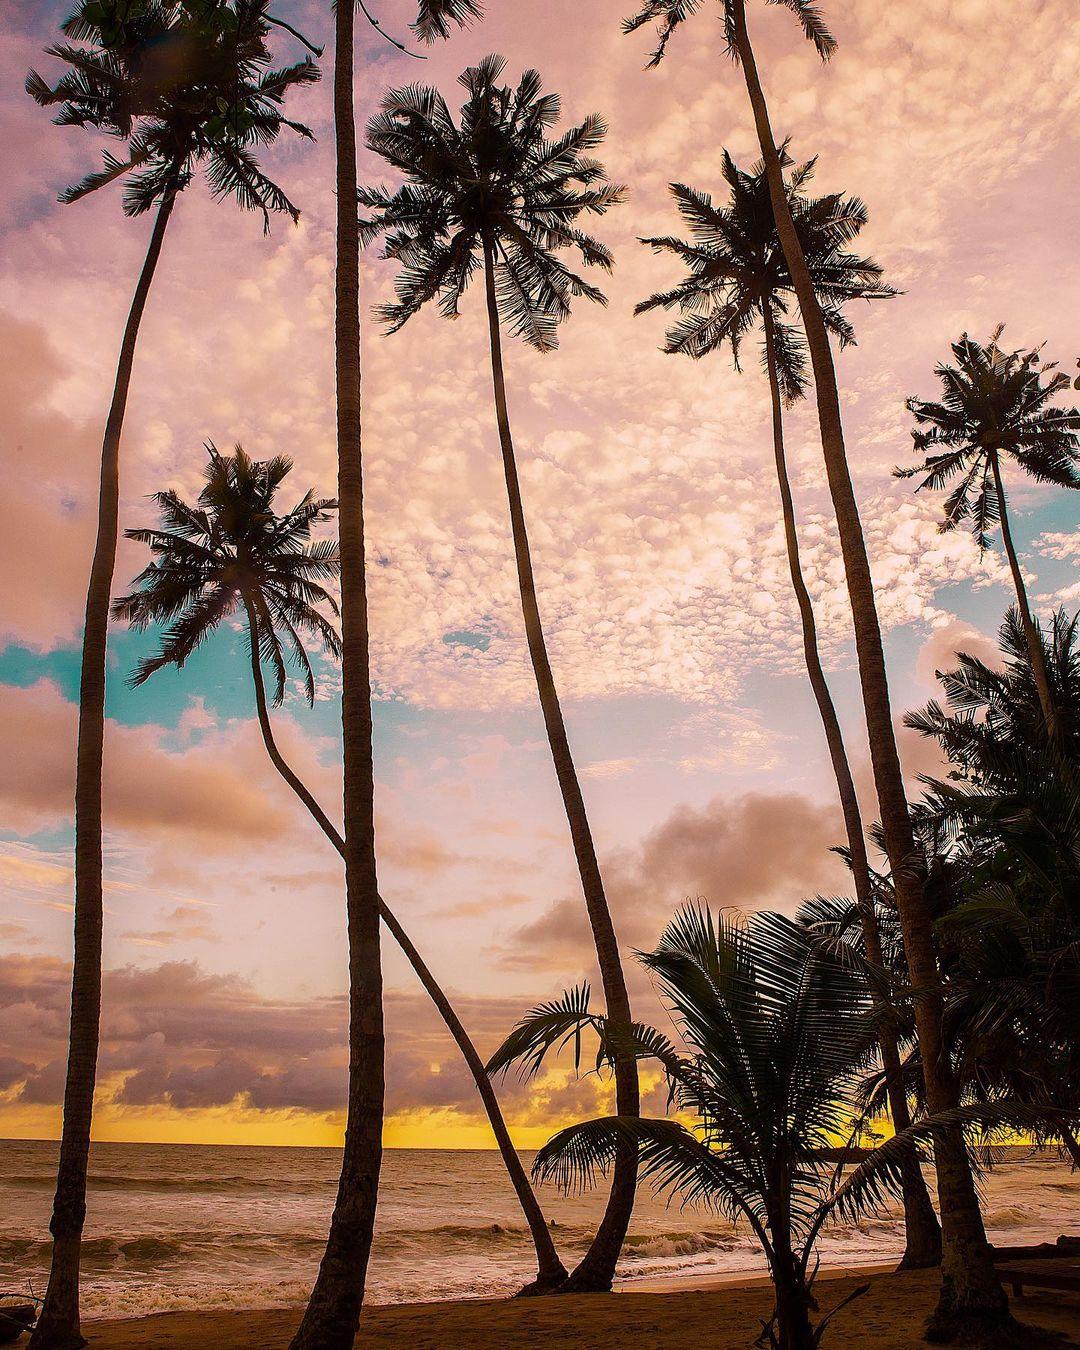 ghana top 10 beach destinations in Africa